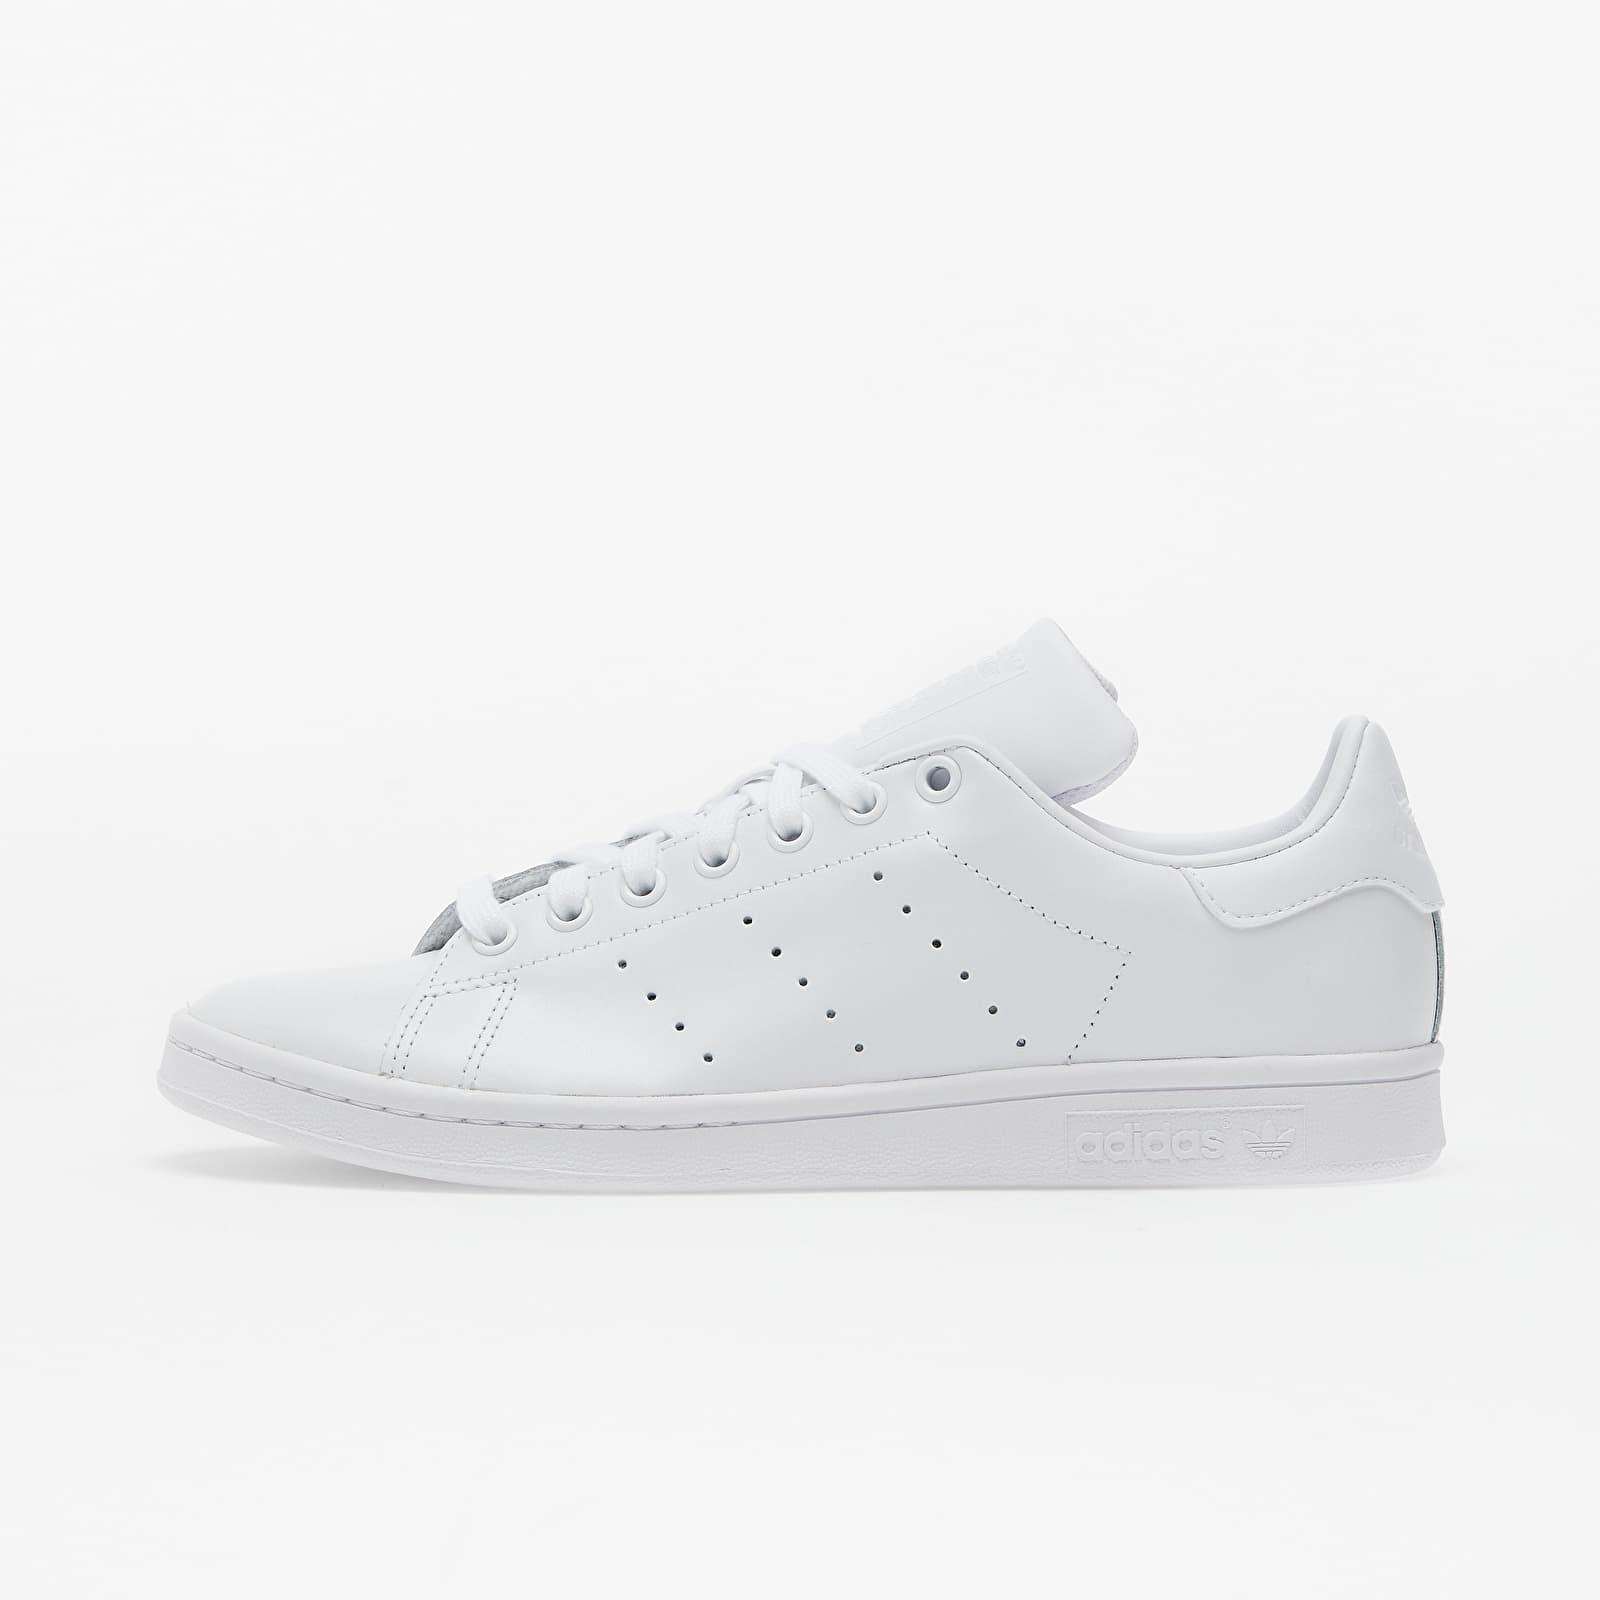 Pánske tenisky a topánky adidas Stan Smith Ftw White/ Ftw White/ Ftw White